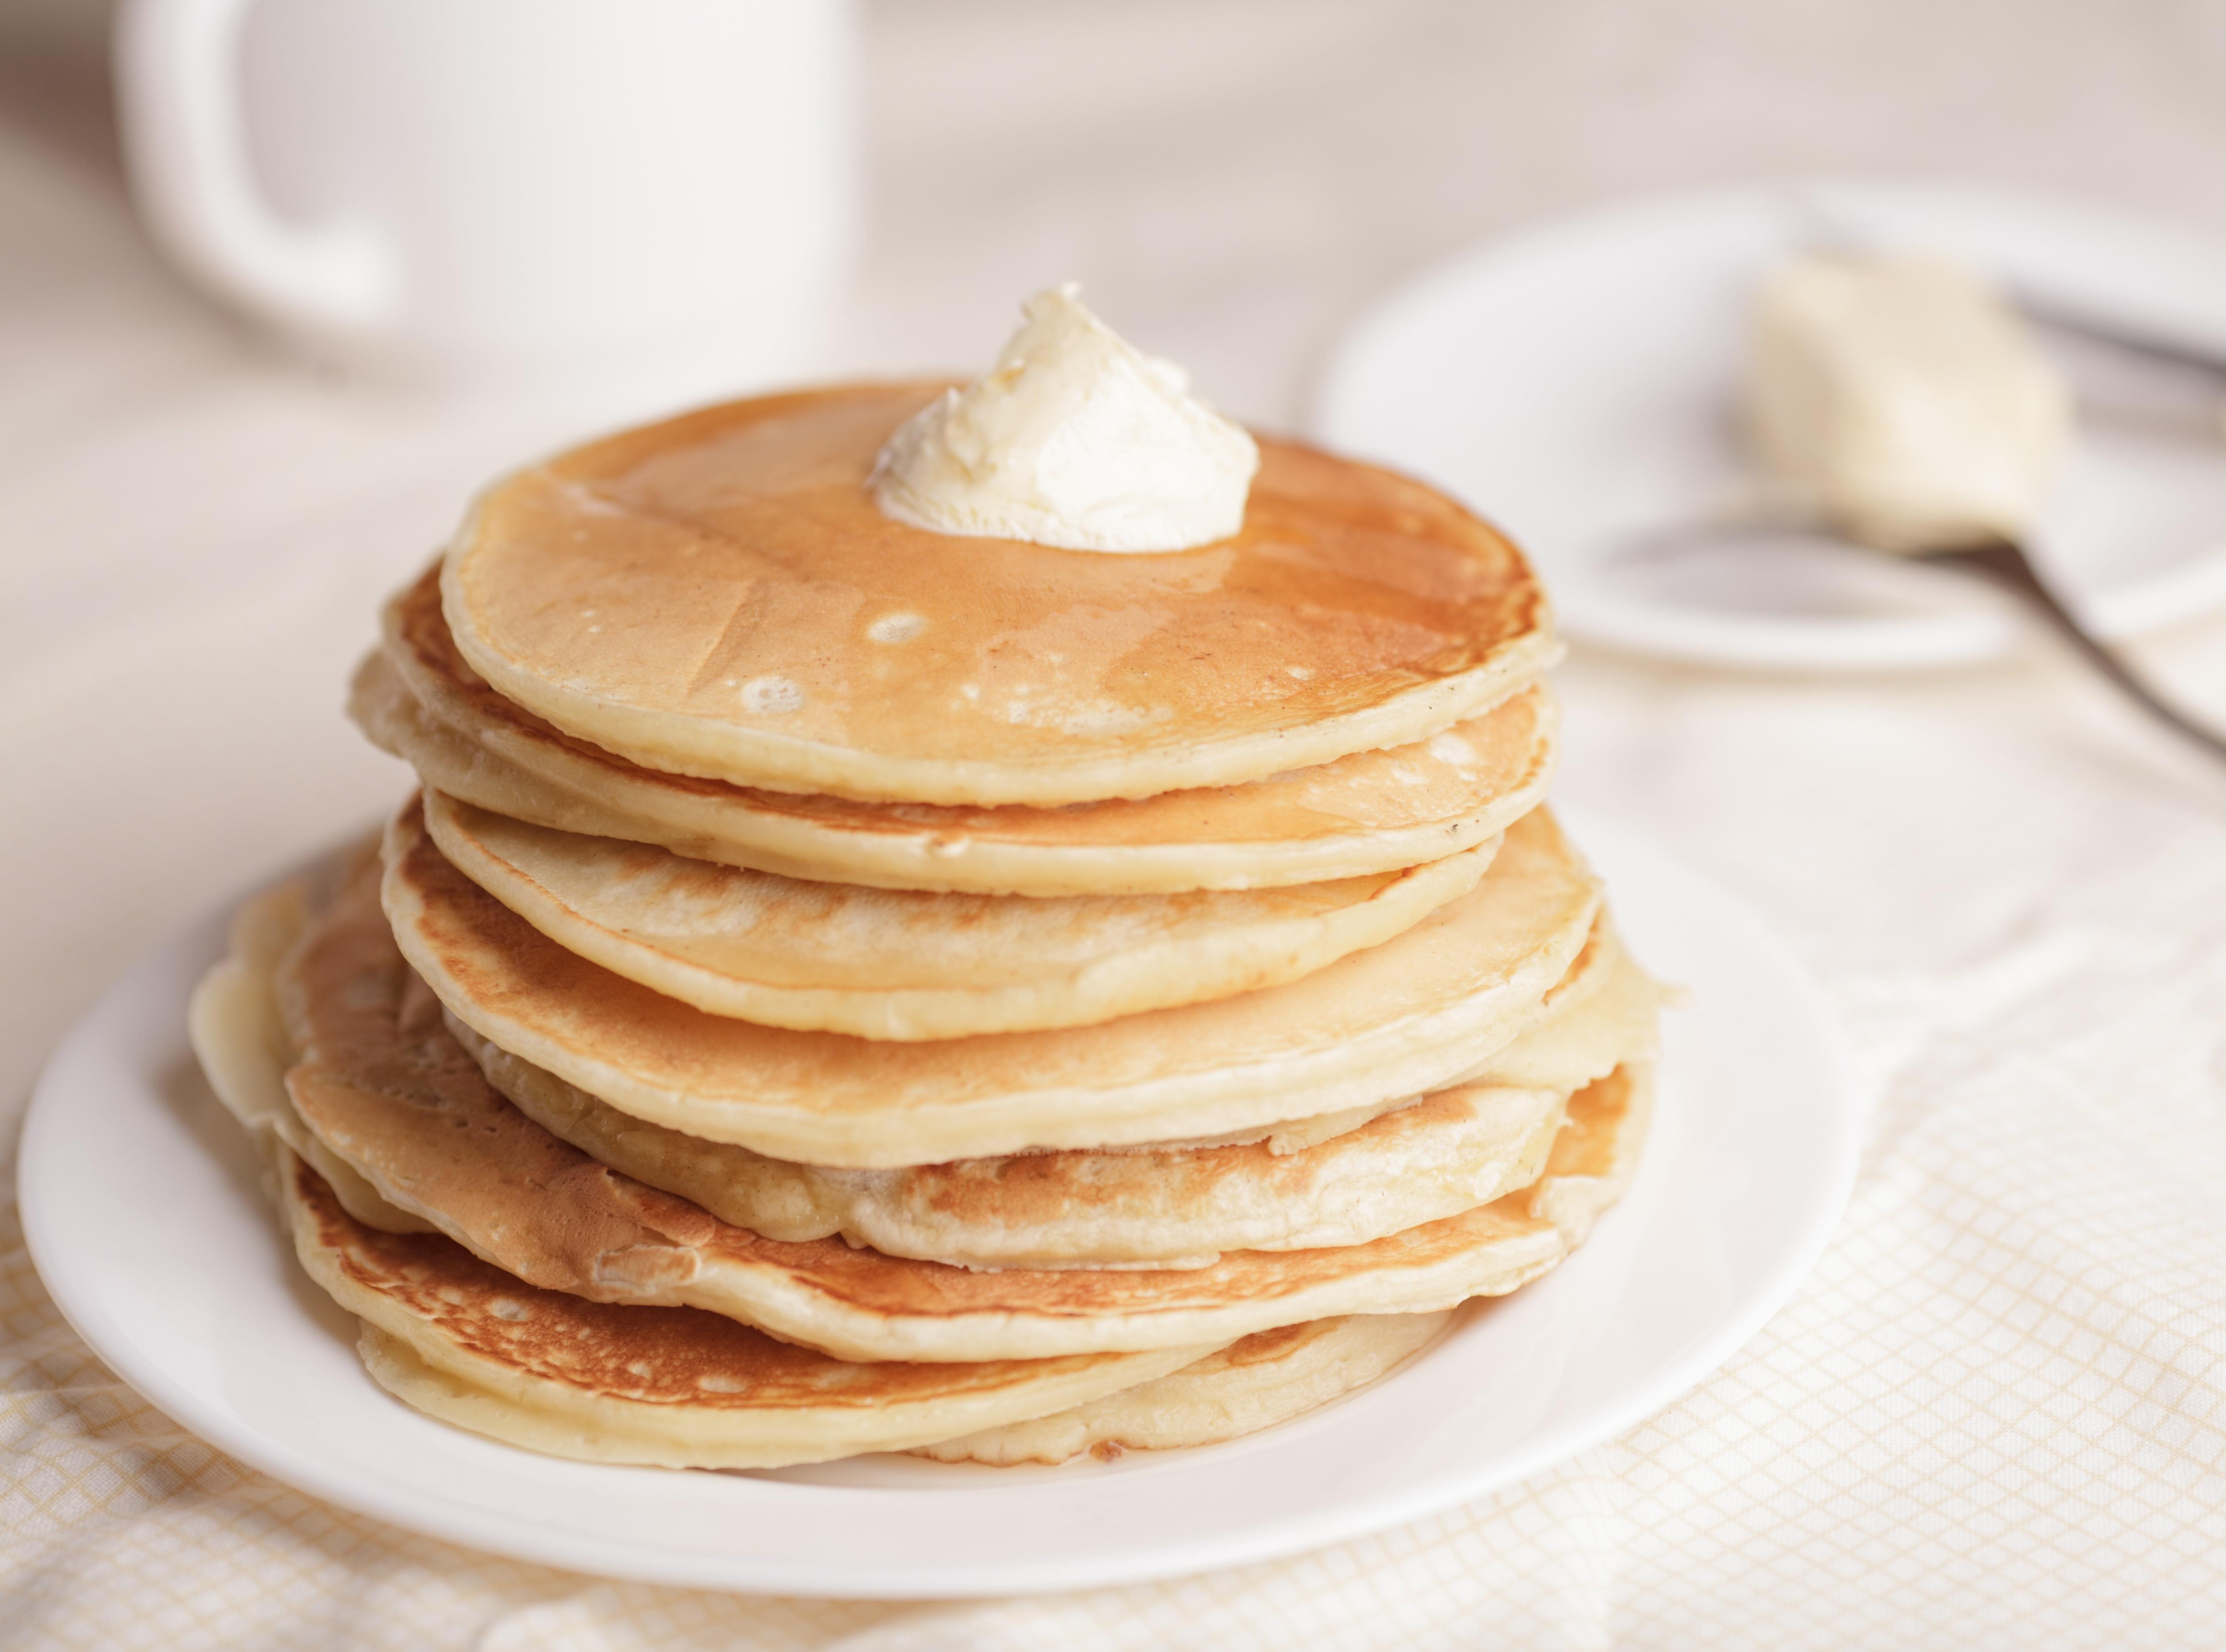 Home Made Pancakes  Fluffy Homemade Pancakes BigOven